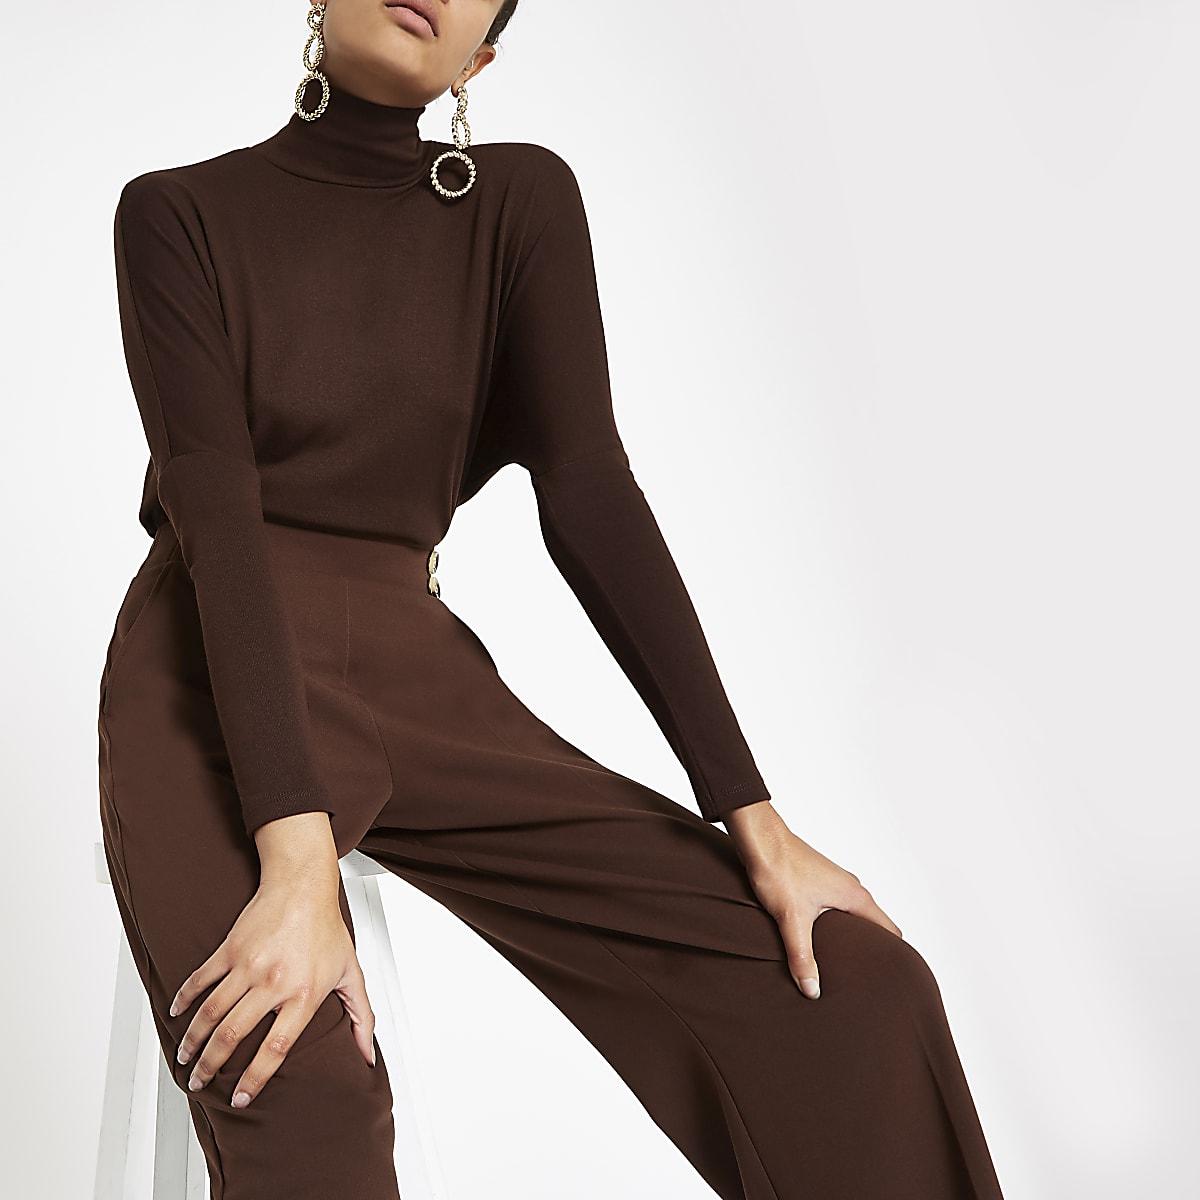 Dark brown roll neck batwing sleeve top